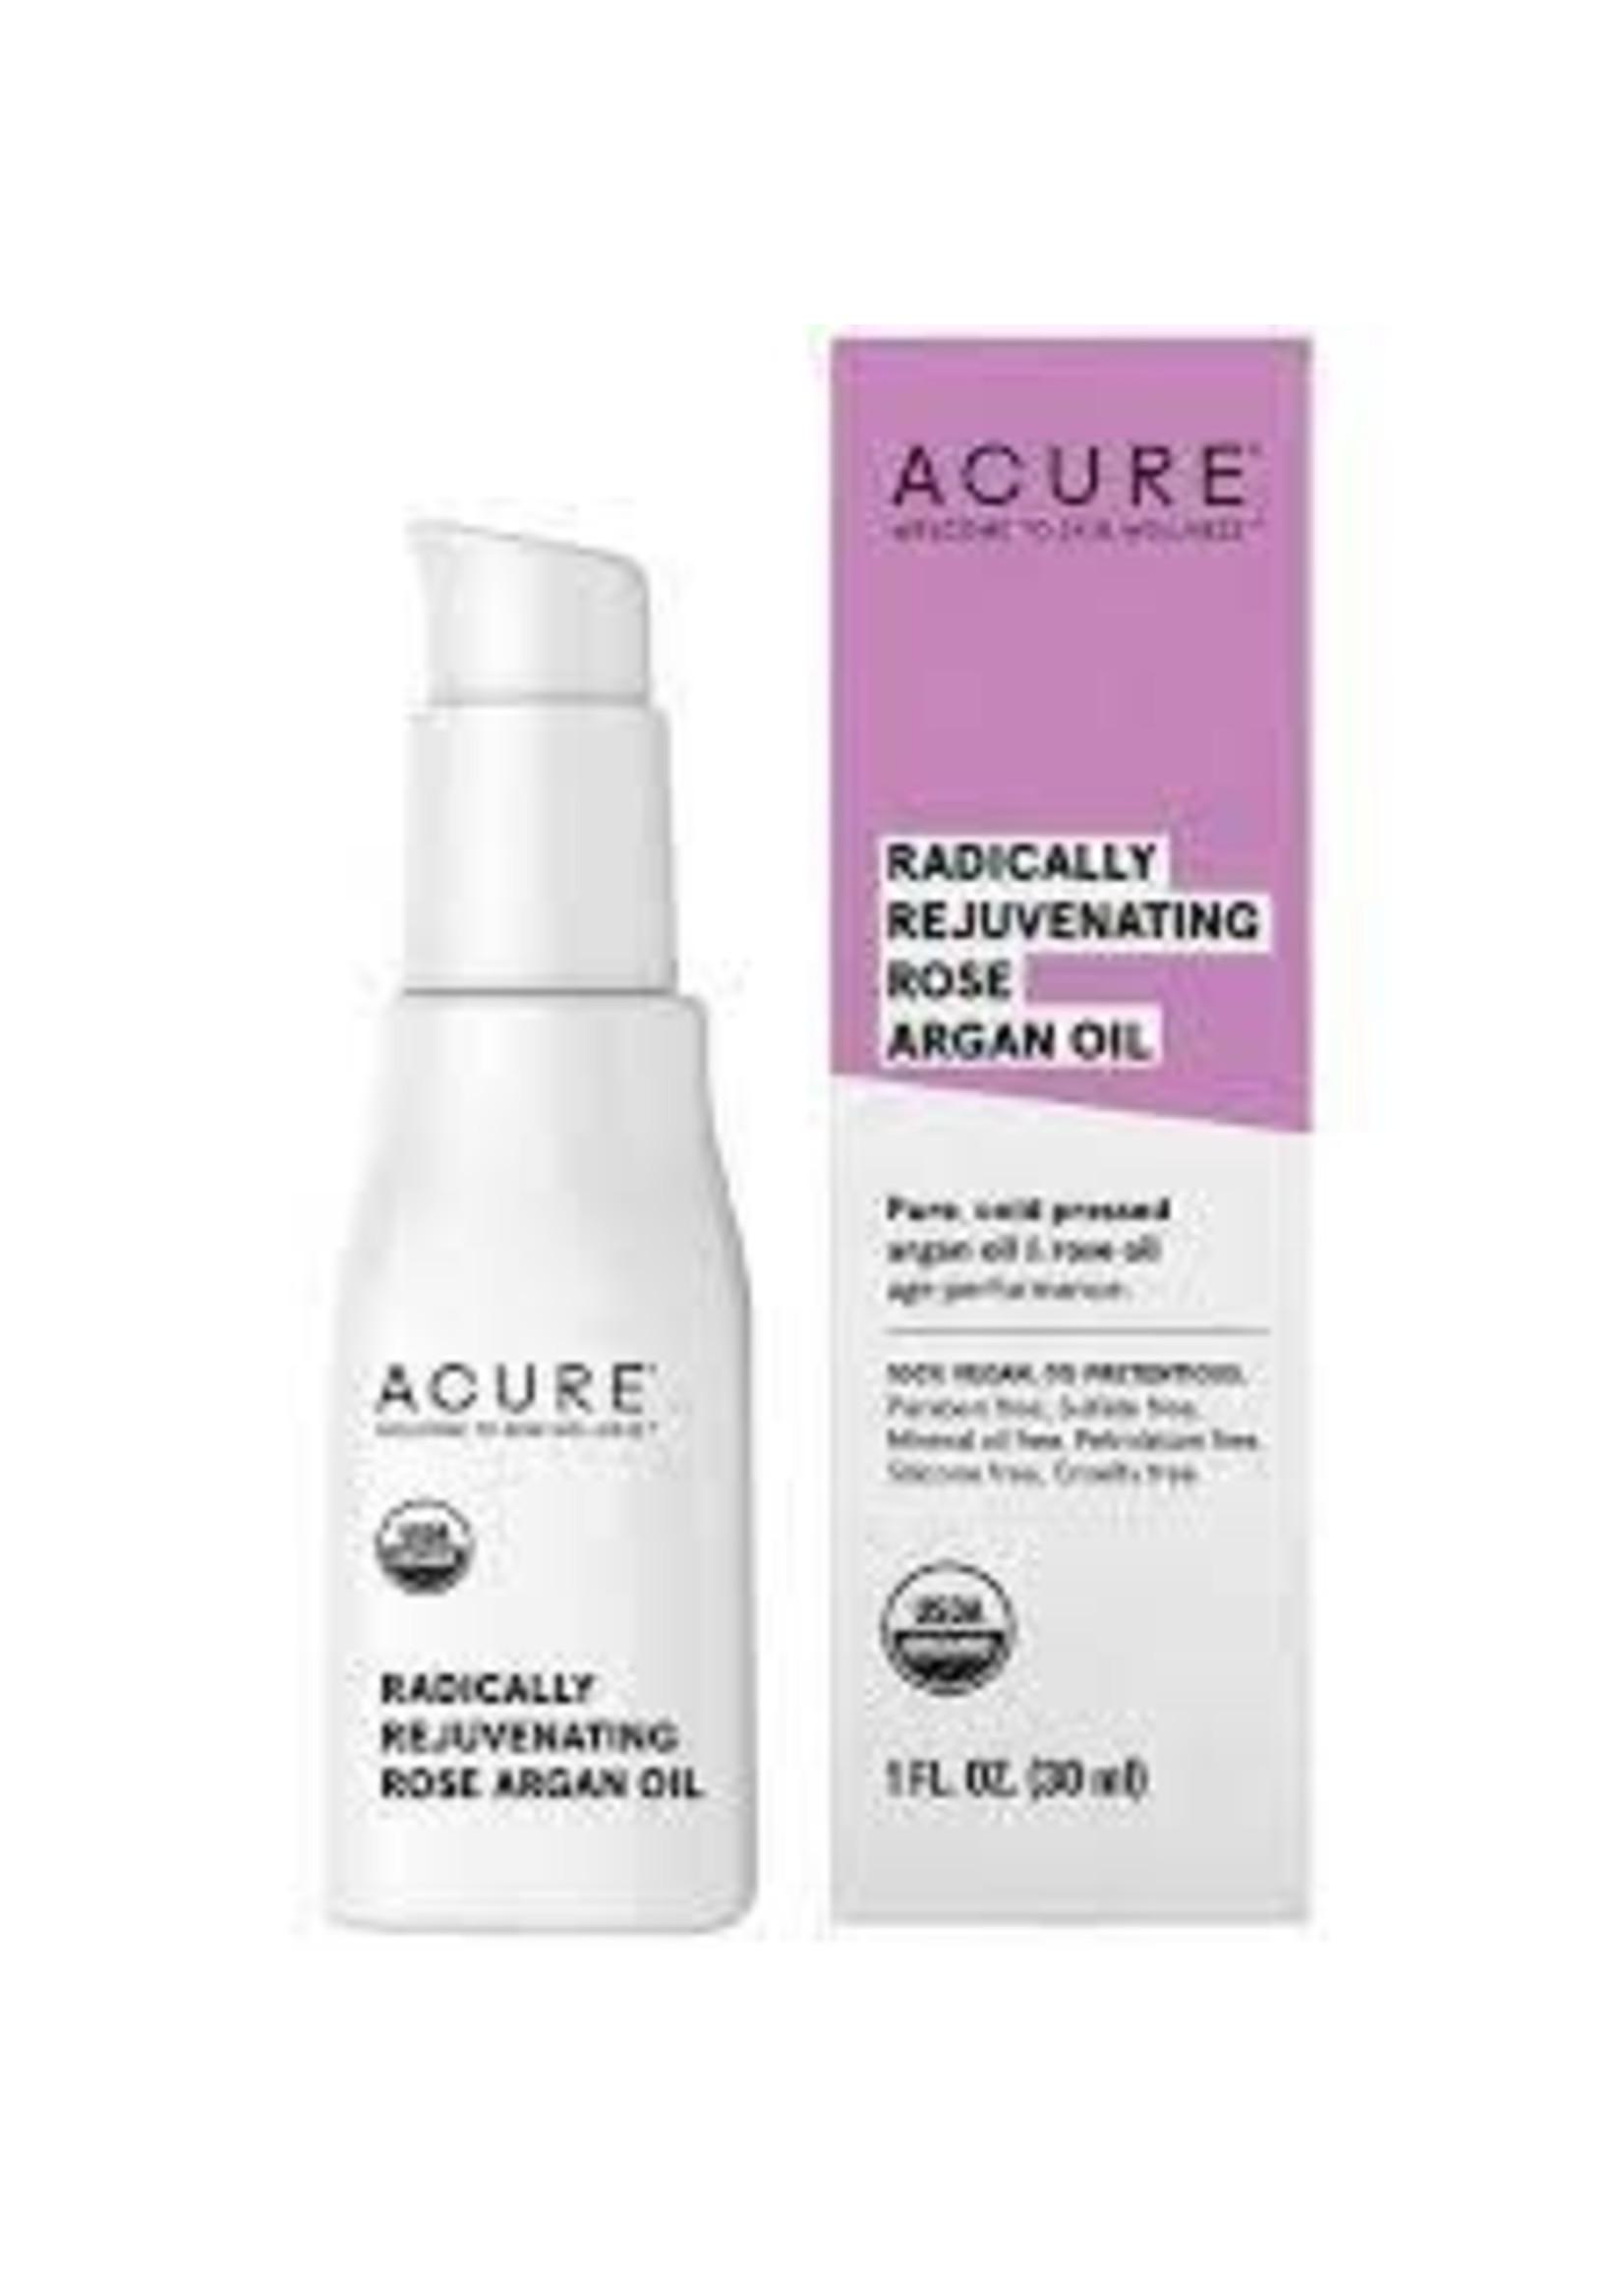 Acure Acure Radically Rejuvinating Rose Argan Oil 30ml